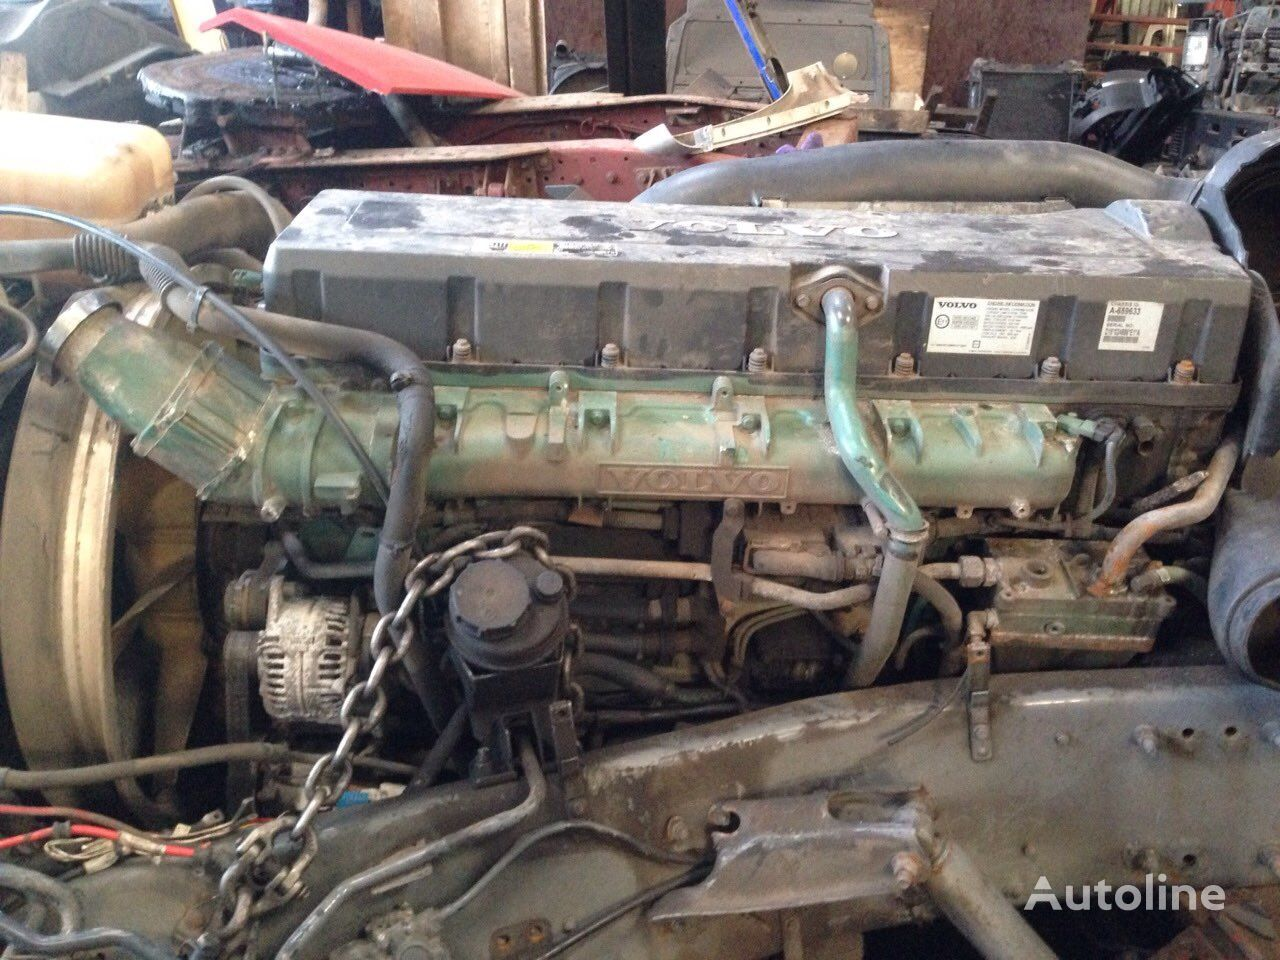 двигатель VOLVO FH16 D16E engine, EURO5, EURO4 emission D16E660 EC06, 660PS, 485 для тягача VOLVO FH16